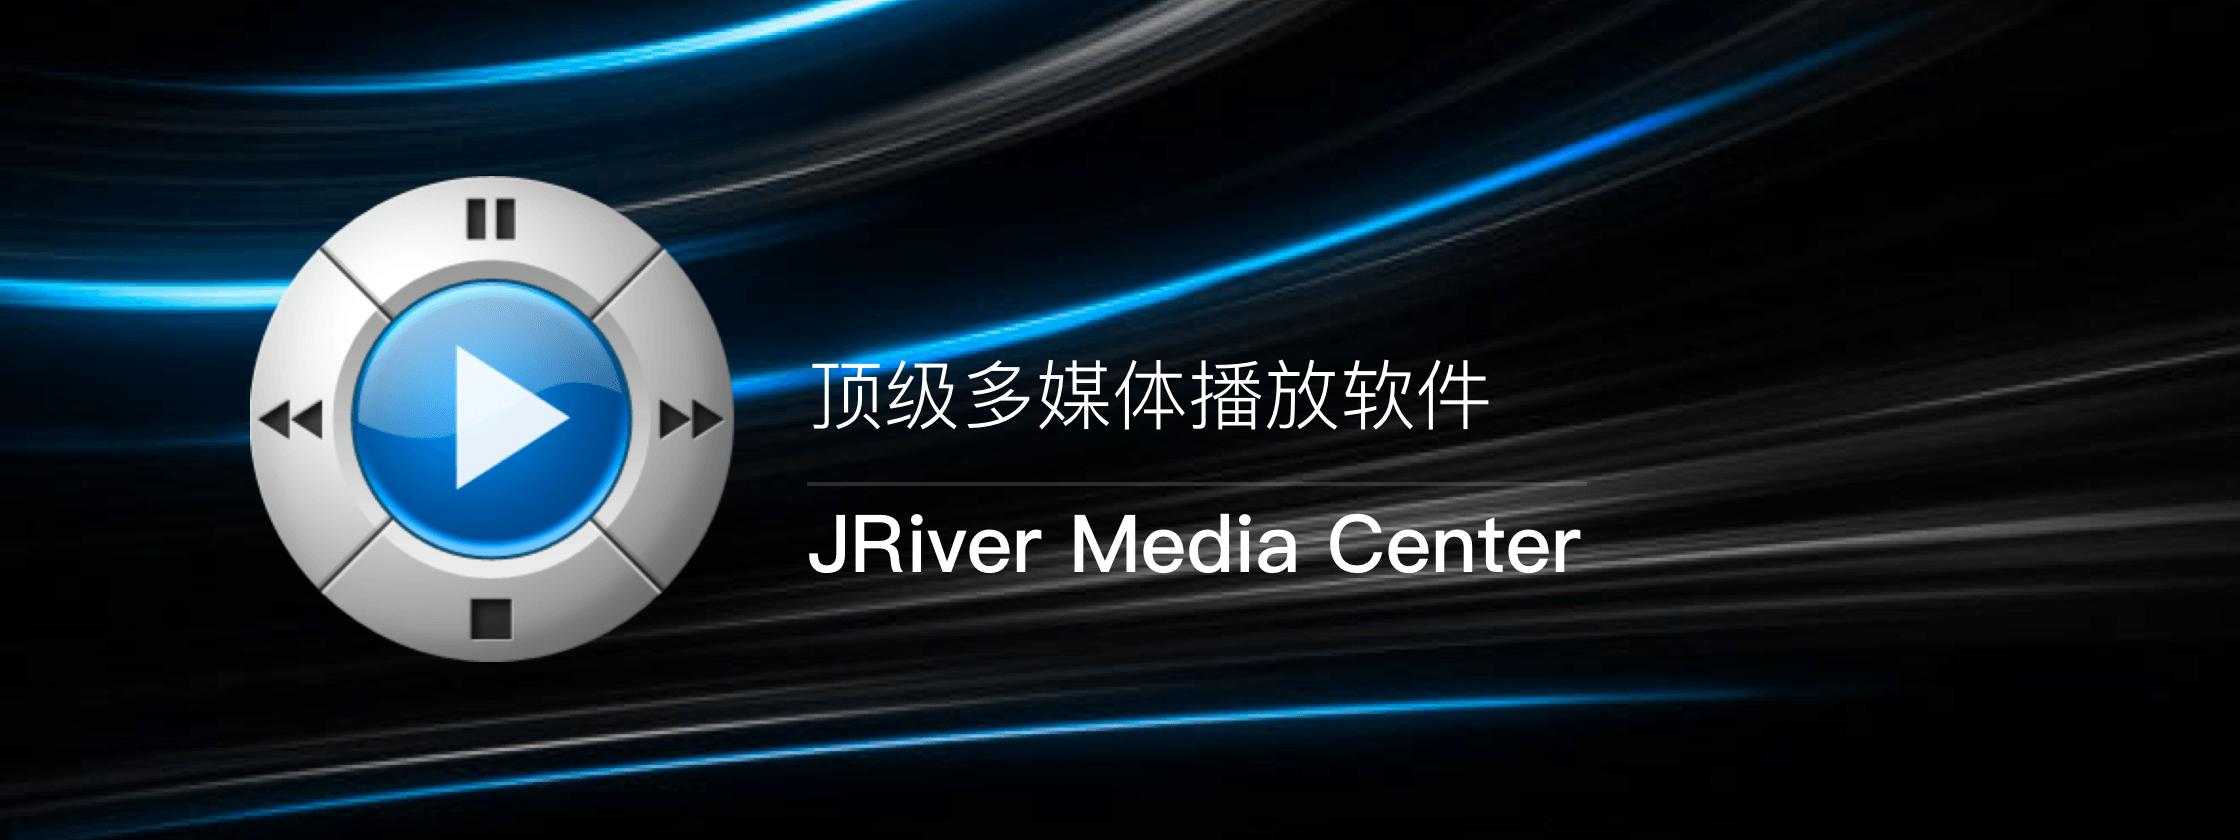 JRiver Media Center – 顶级多媒体播放软件